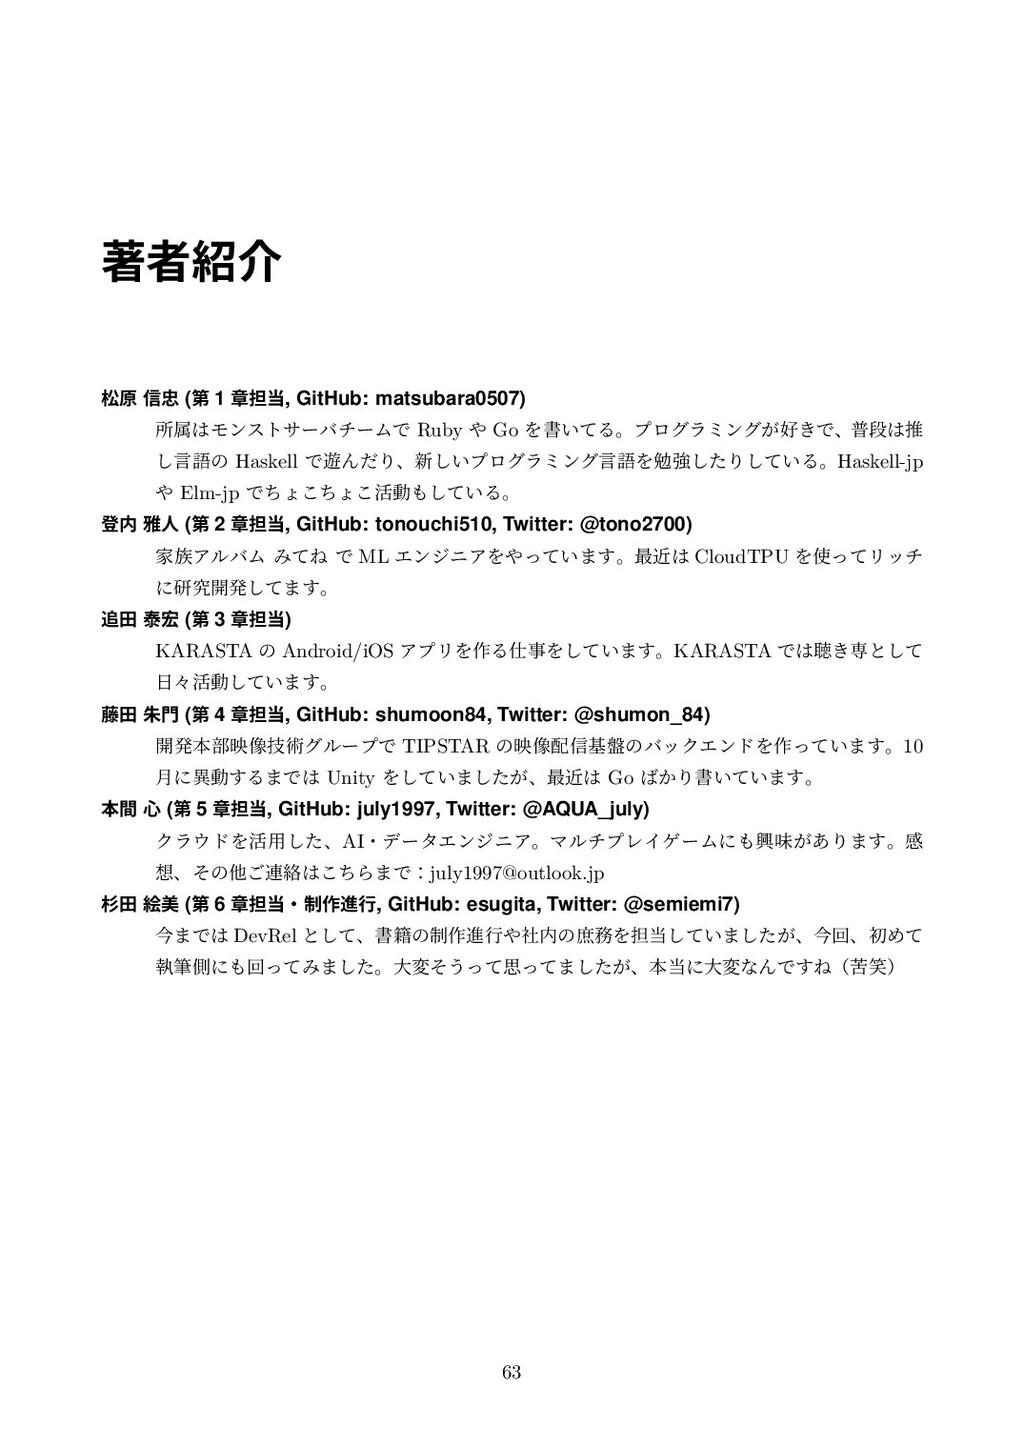 ஶऀհ দݪ ৴ (ୈ 1 ষ୲, GitHub: matsubara0507) ॴଐ...